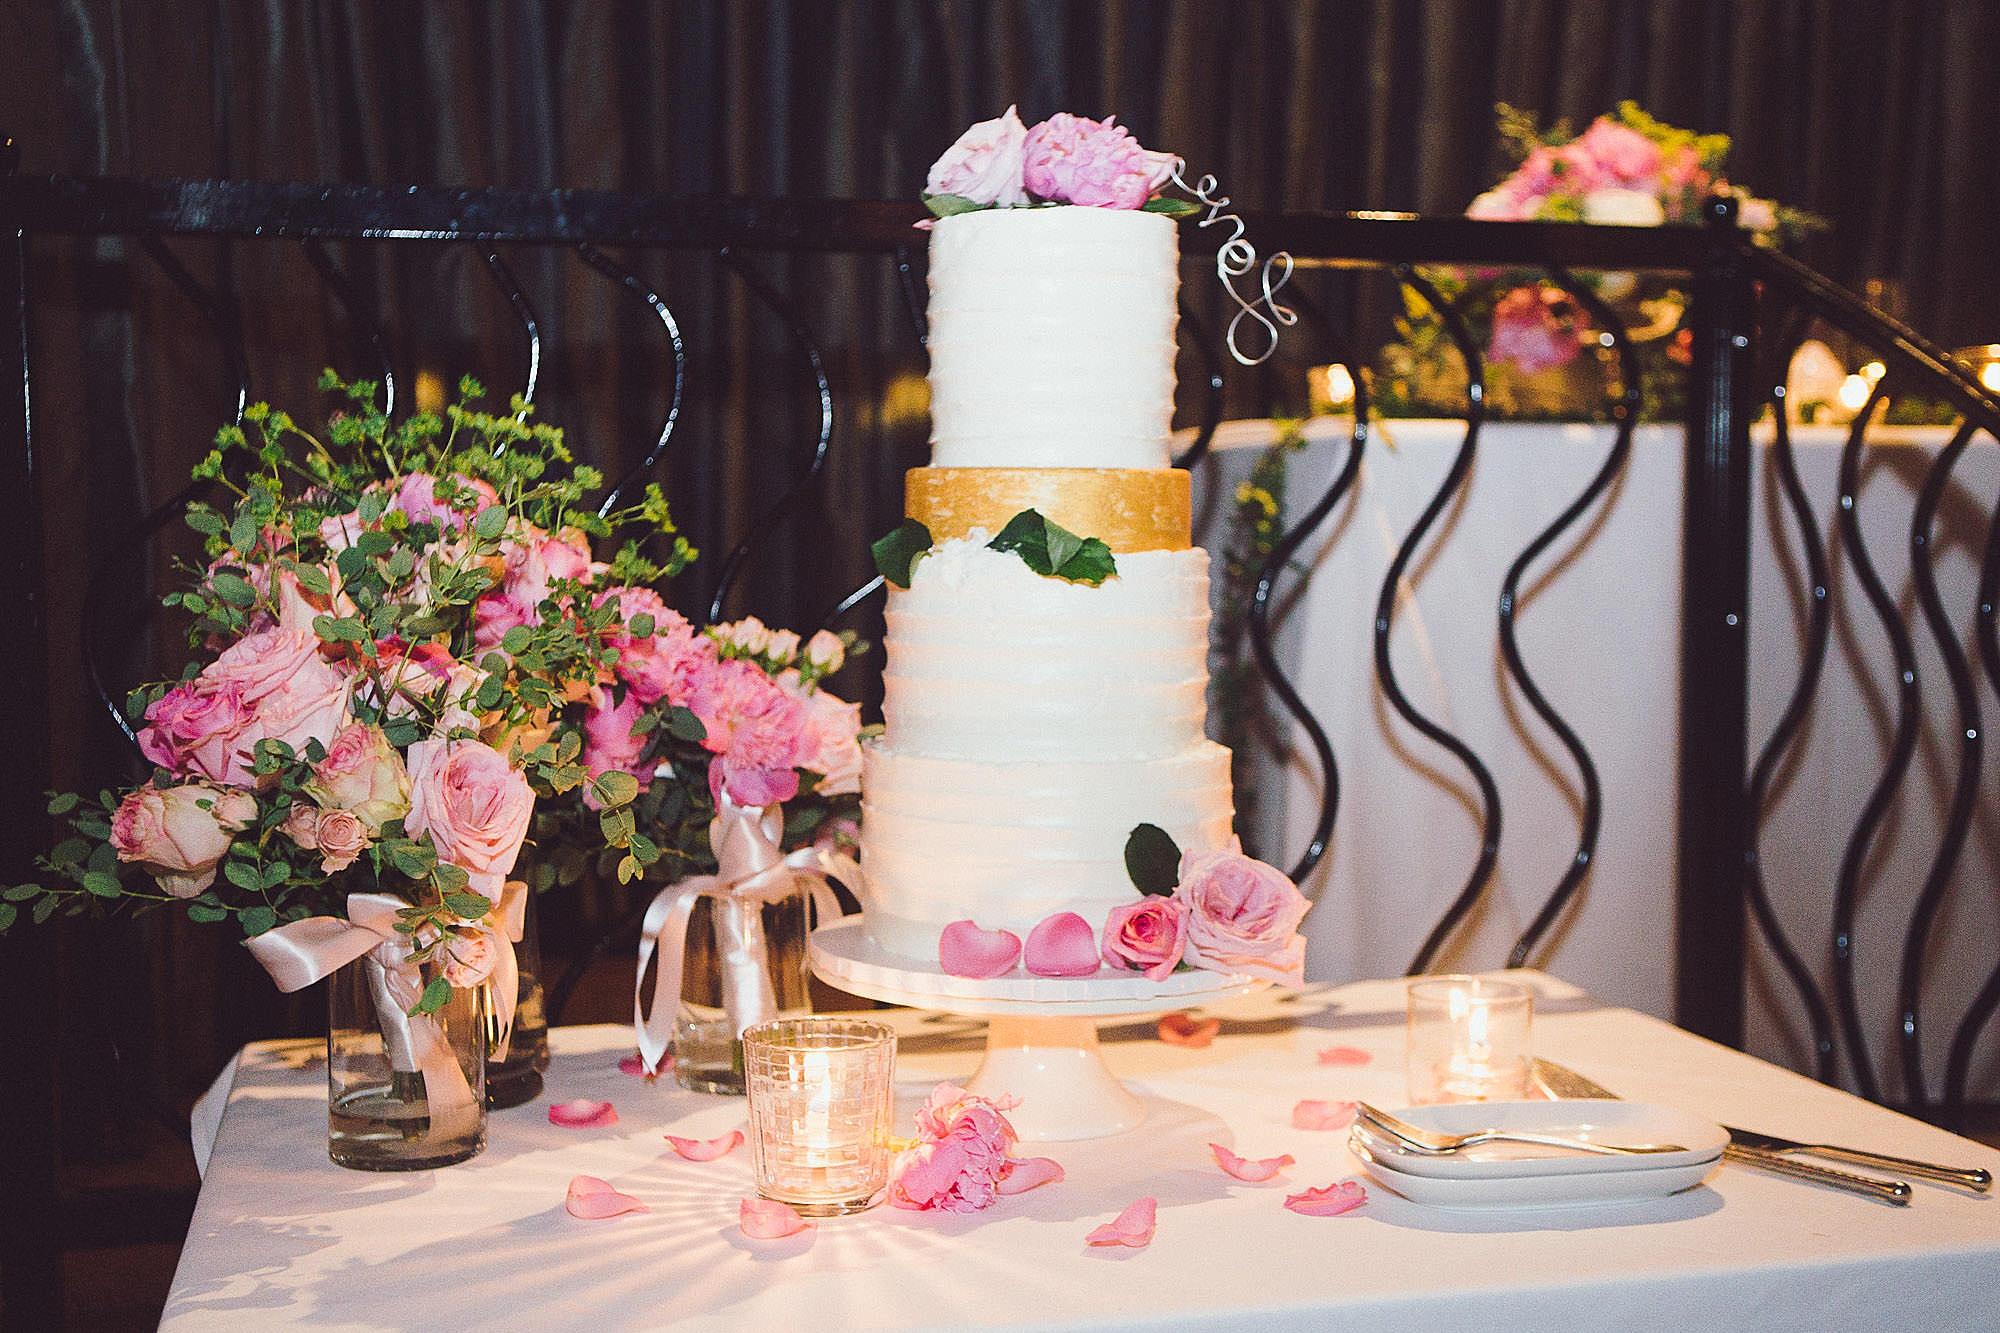 Their beautiful wedding cake!